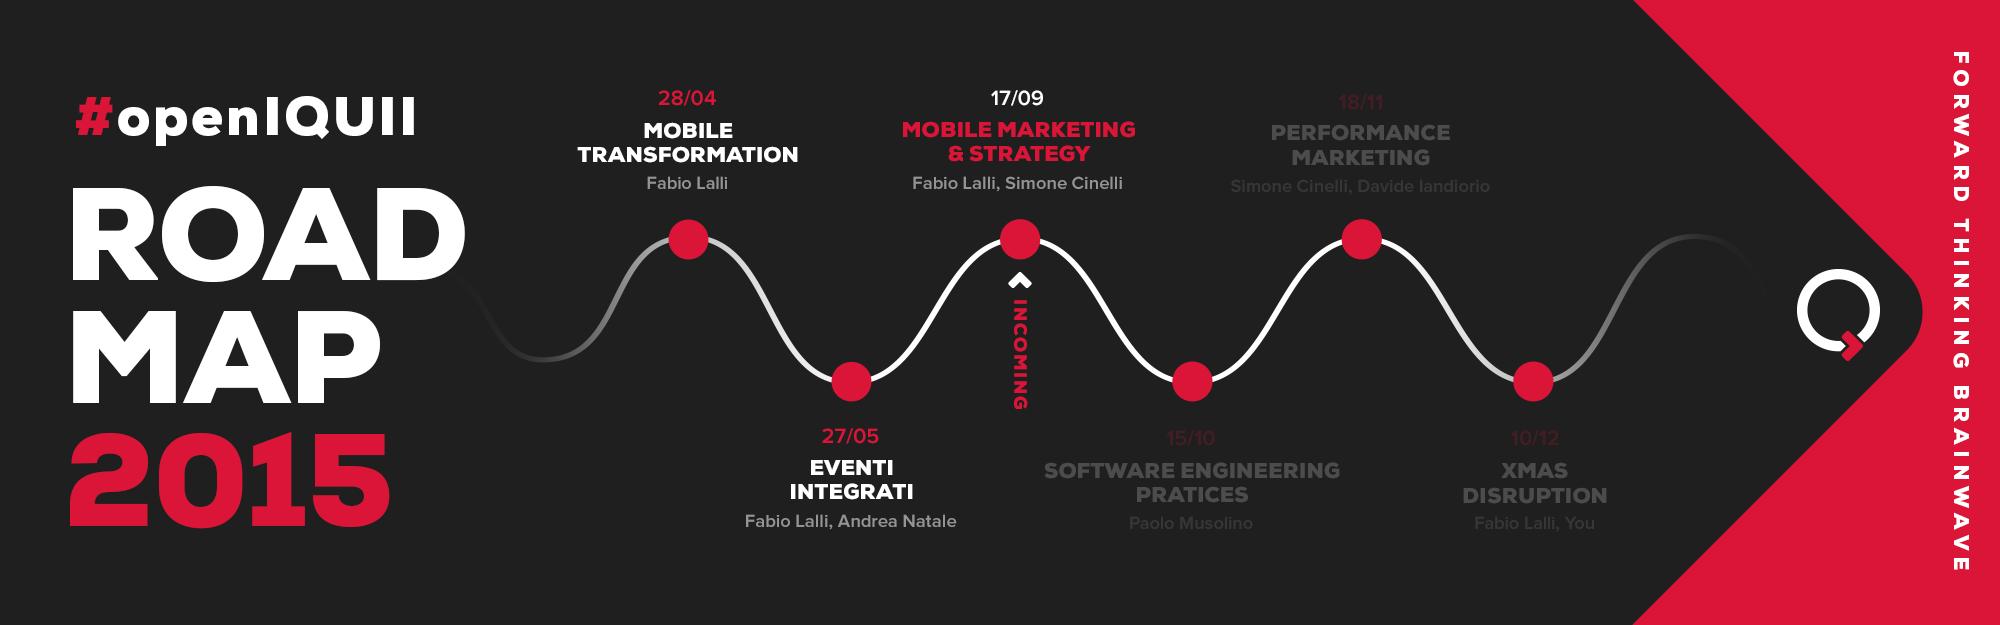 #openIQUII – Mobile Marketing & Strategy